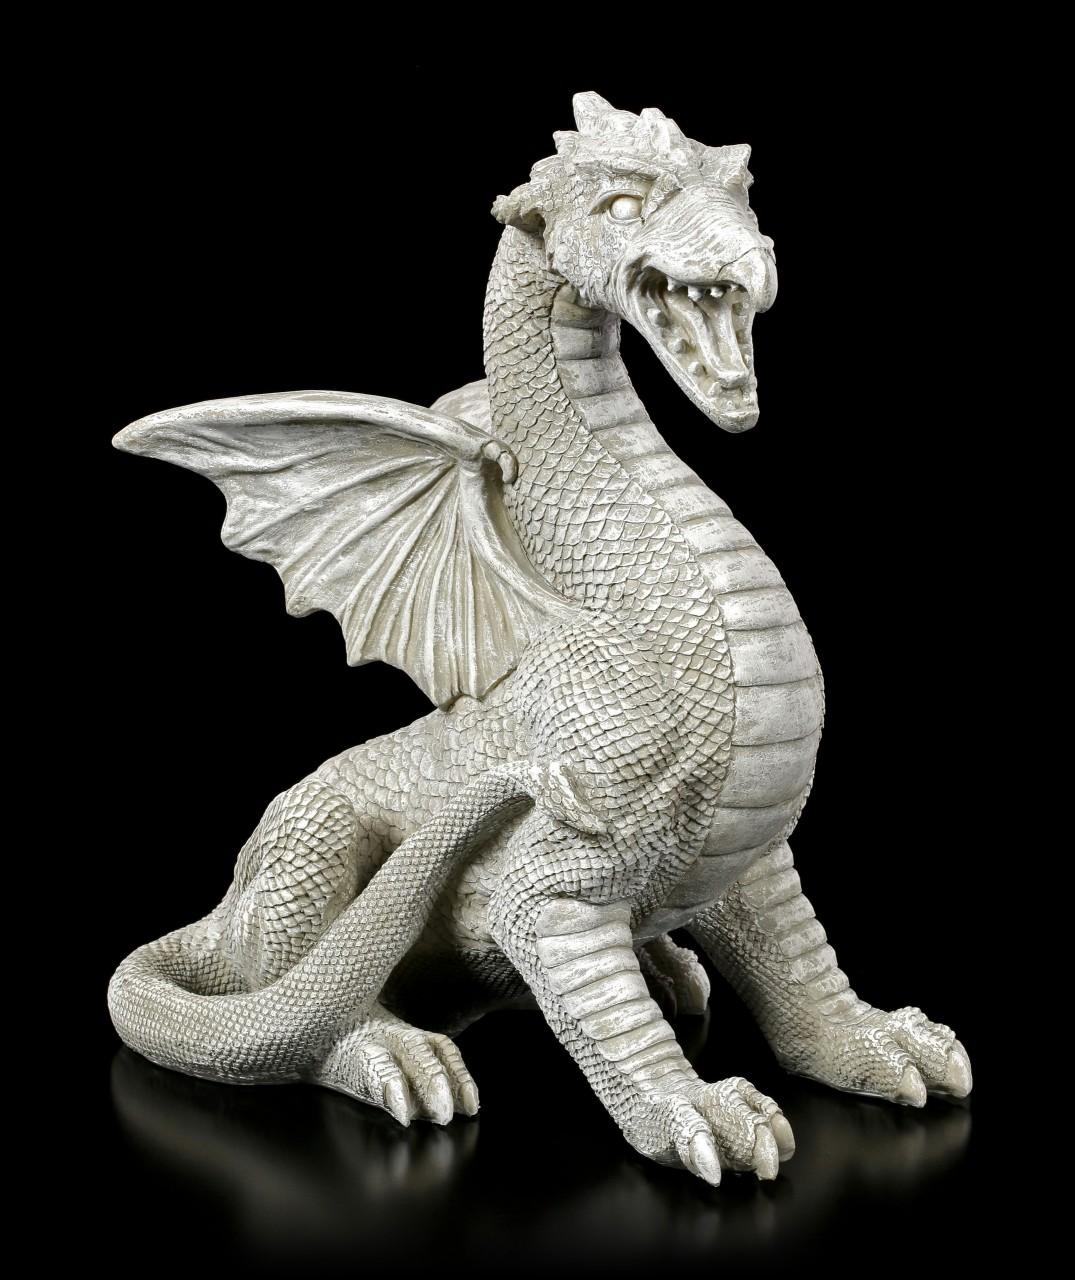 Garden Figurine - Dragon growling